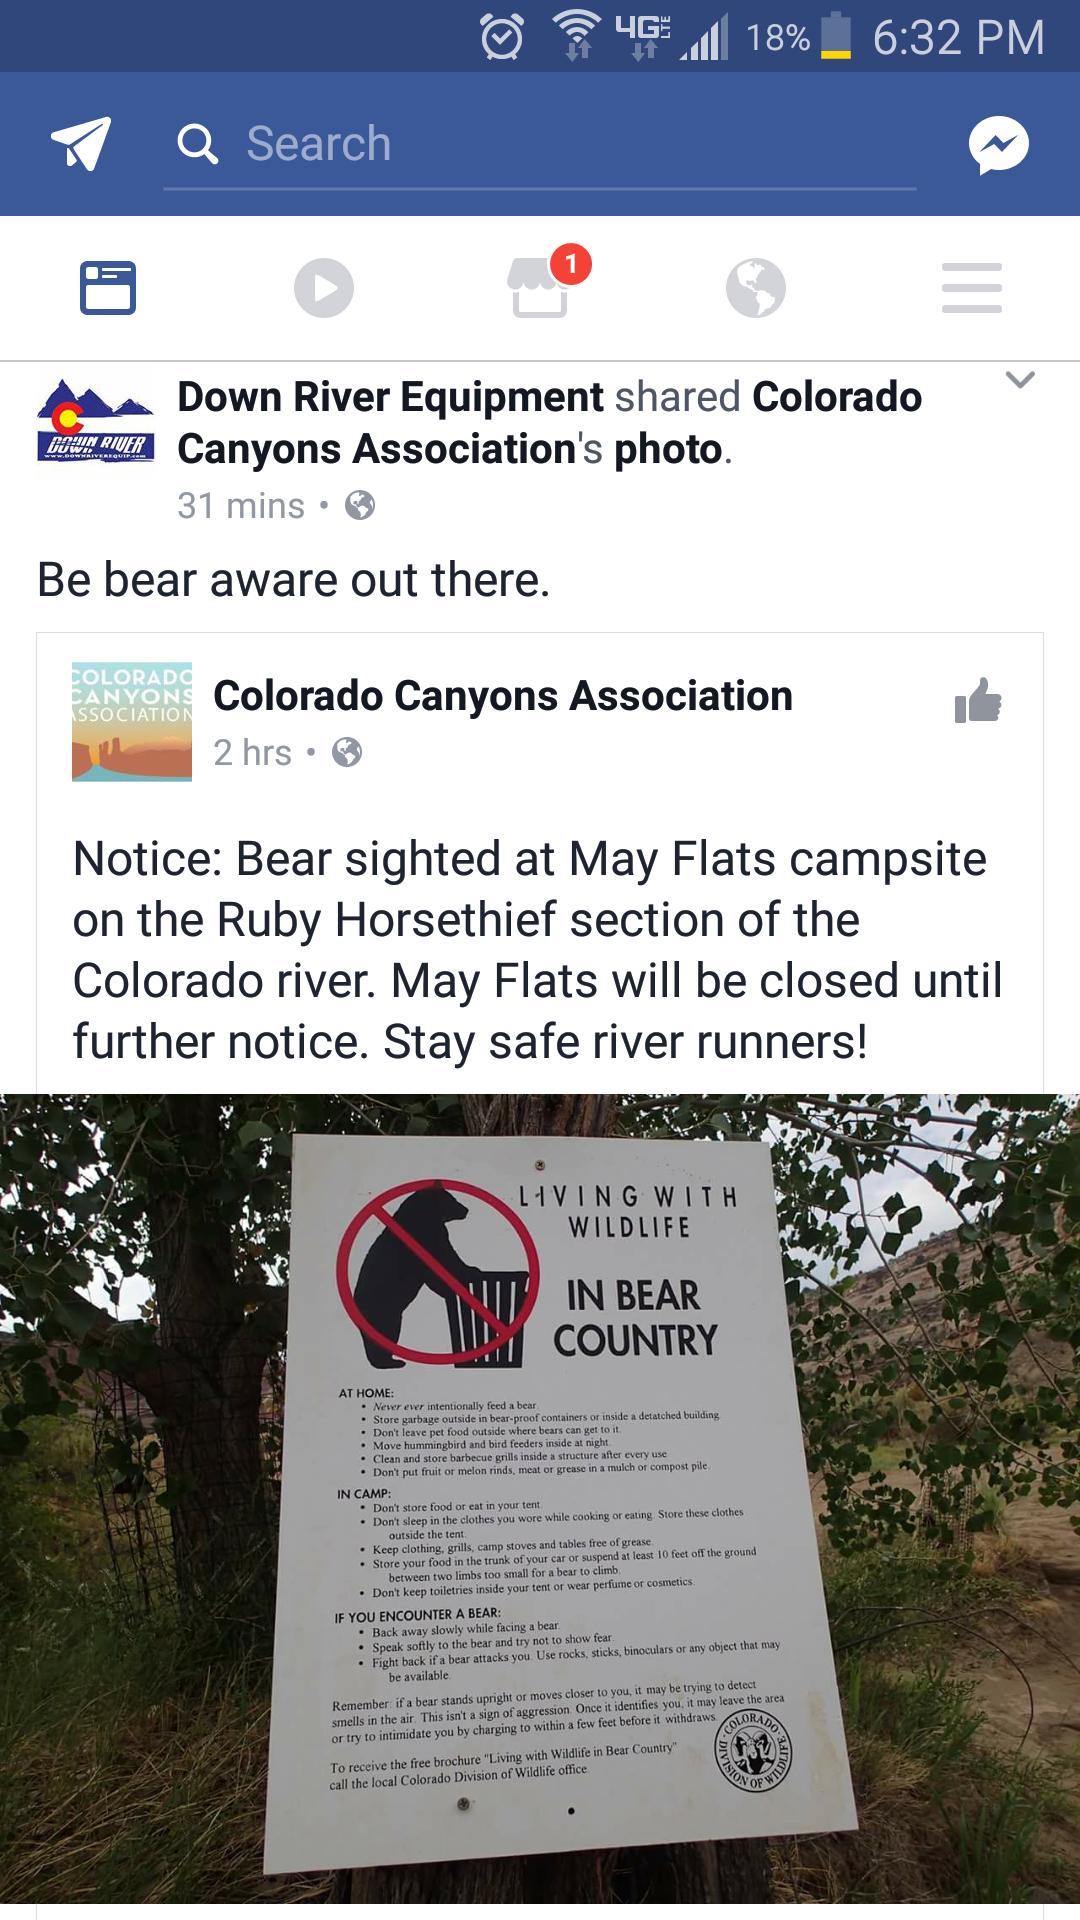 May Flats / Ruby Horsethief Campsites - Mountain Buzz